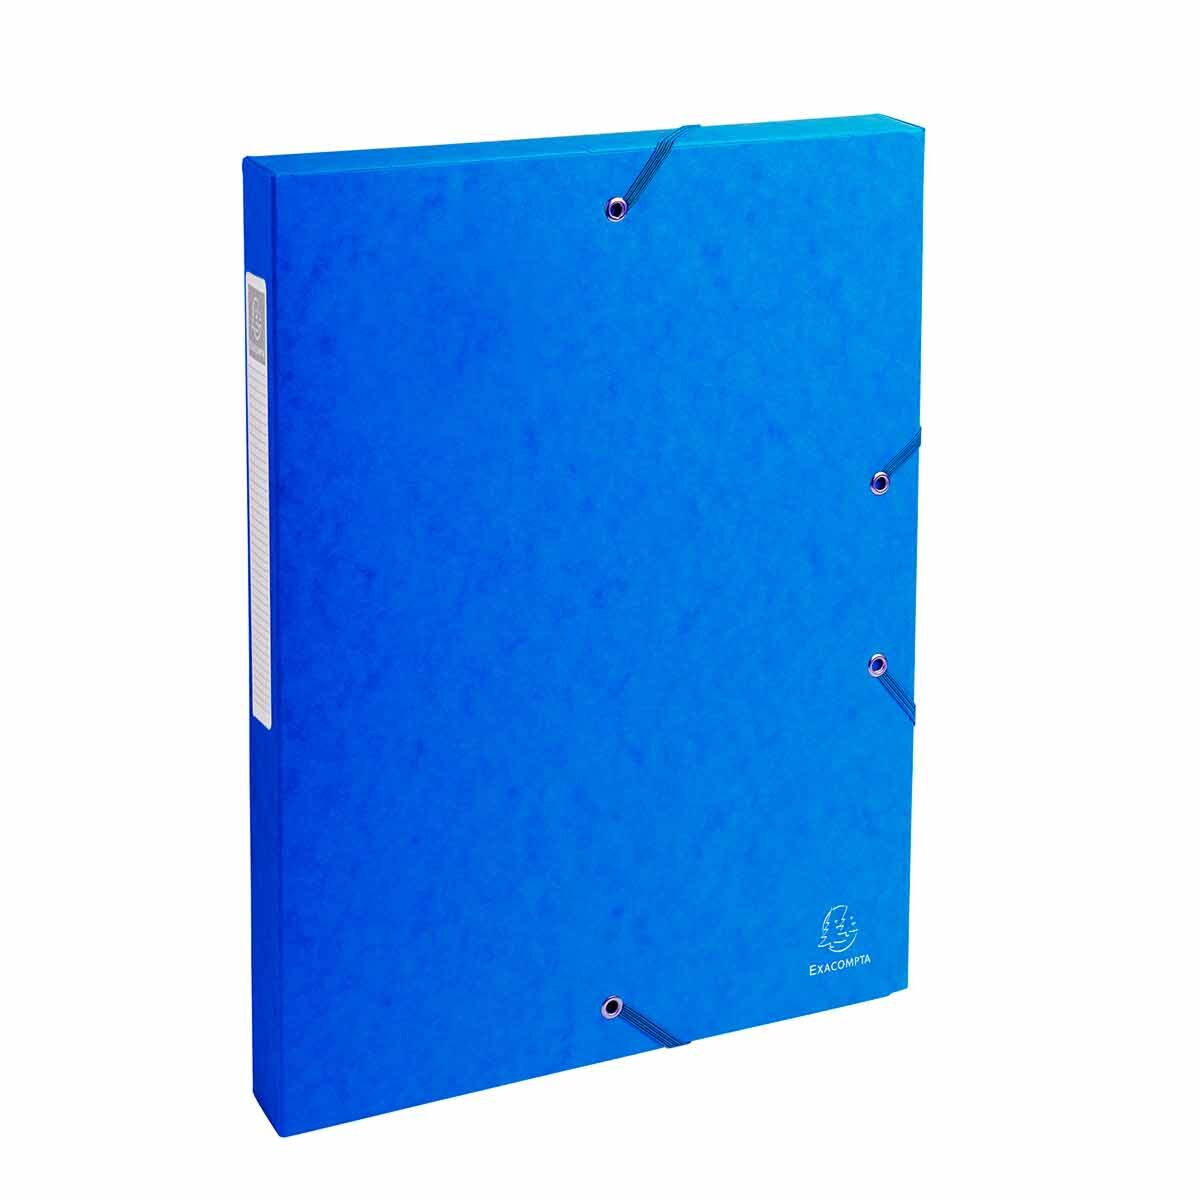 Exacompta Elasticated Box File Pressboard A4 25mm Pack of 8 Blue